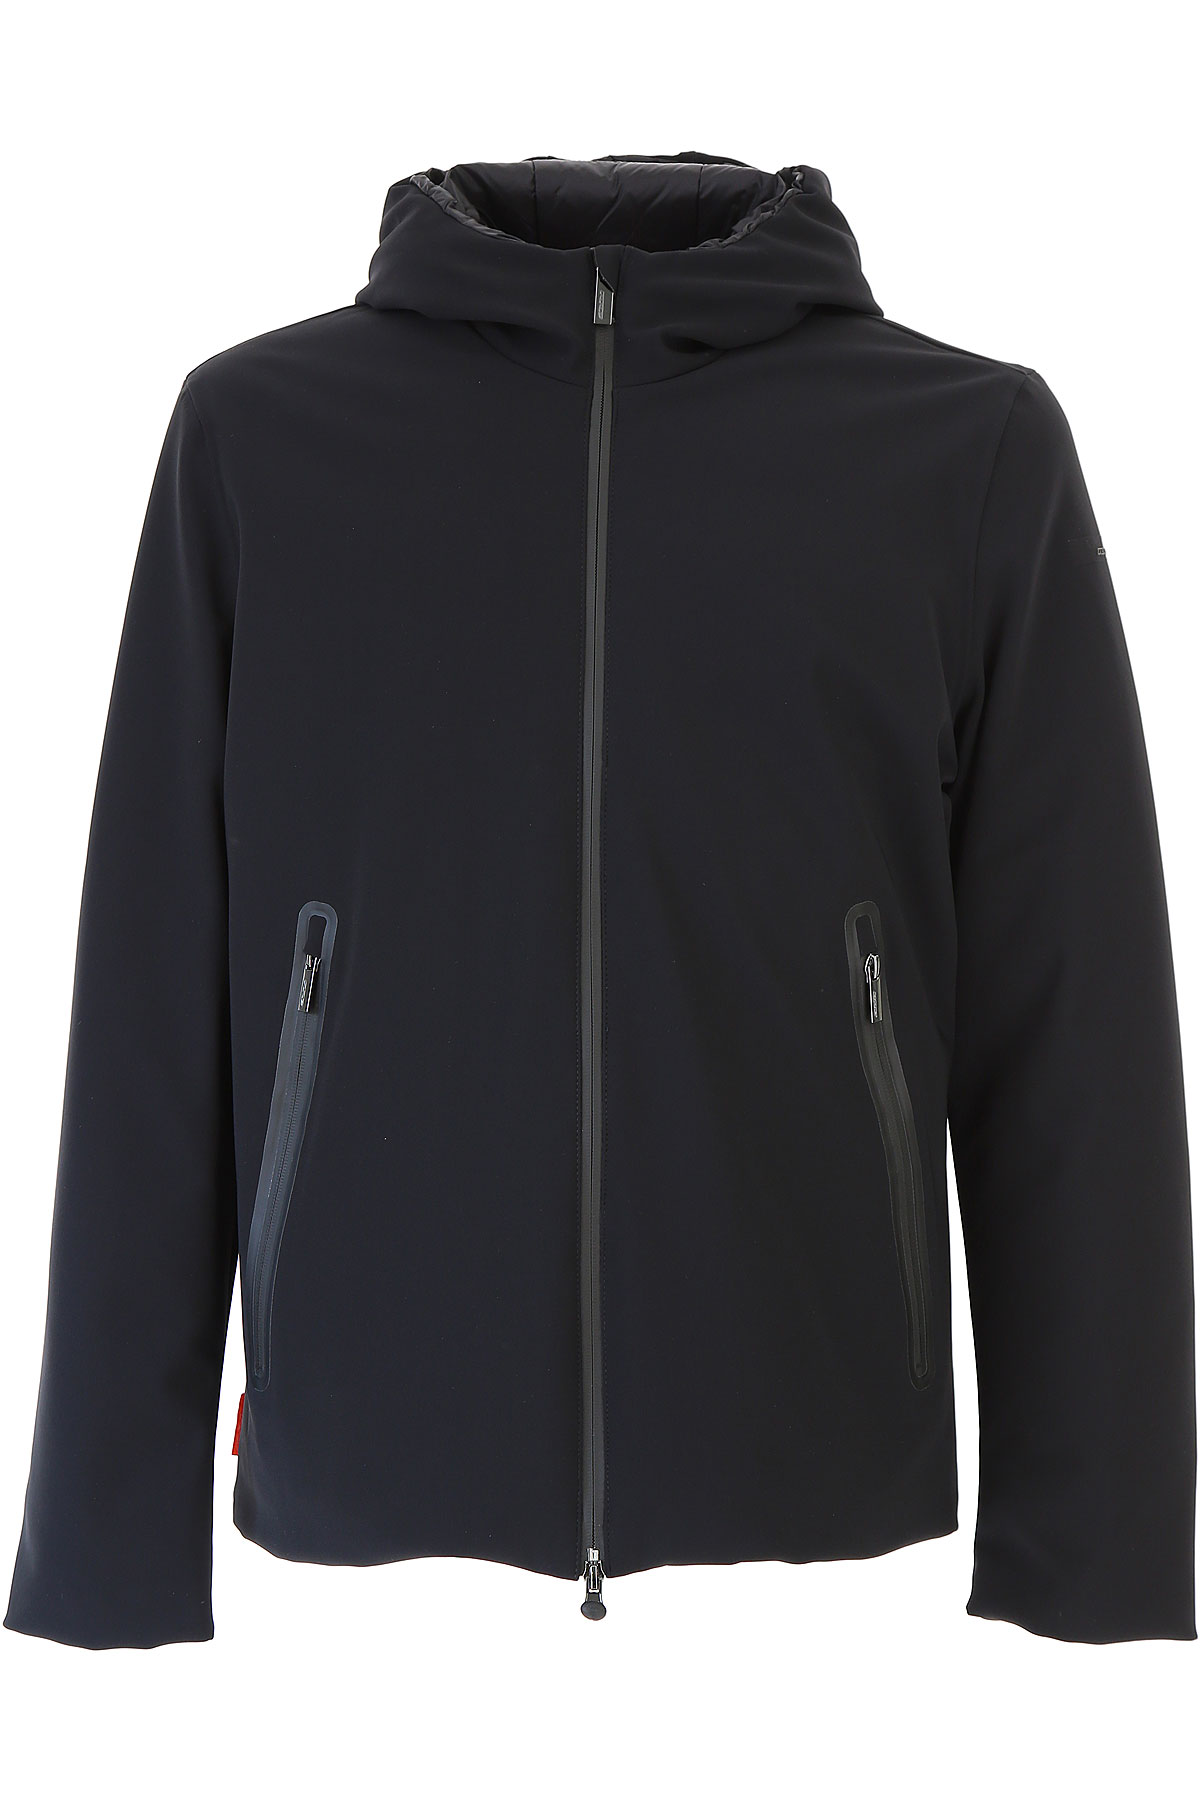 Image of RRD Down Jacket for Men, Puffer Ski Jacket, Black, polyamide, 2017, L M S XL XXL XXXL